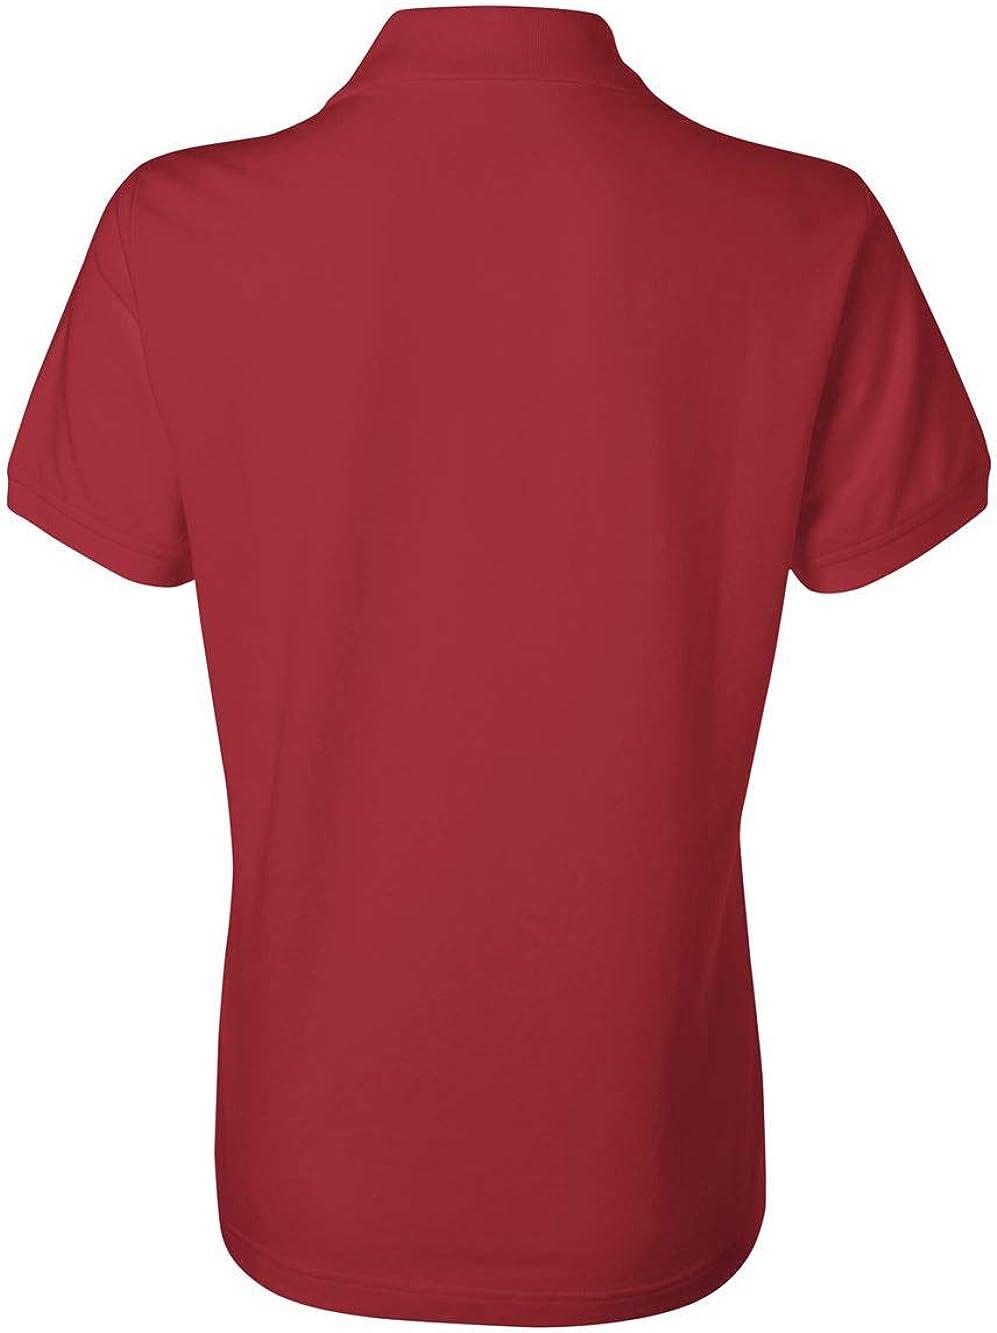 IZOD Womens Silk Wash Short Sleeve Pique Polo Shirt